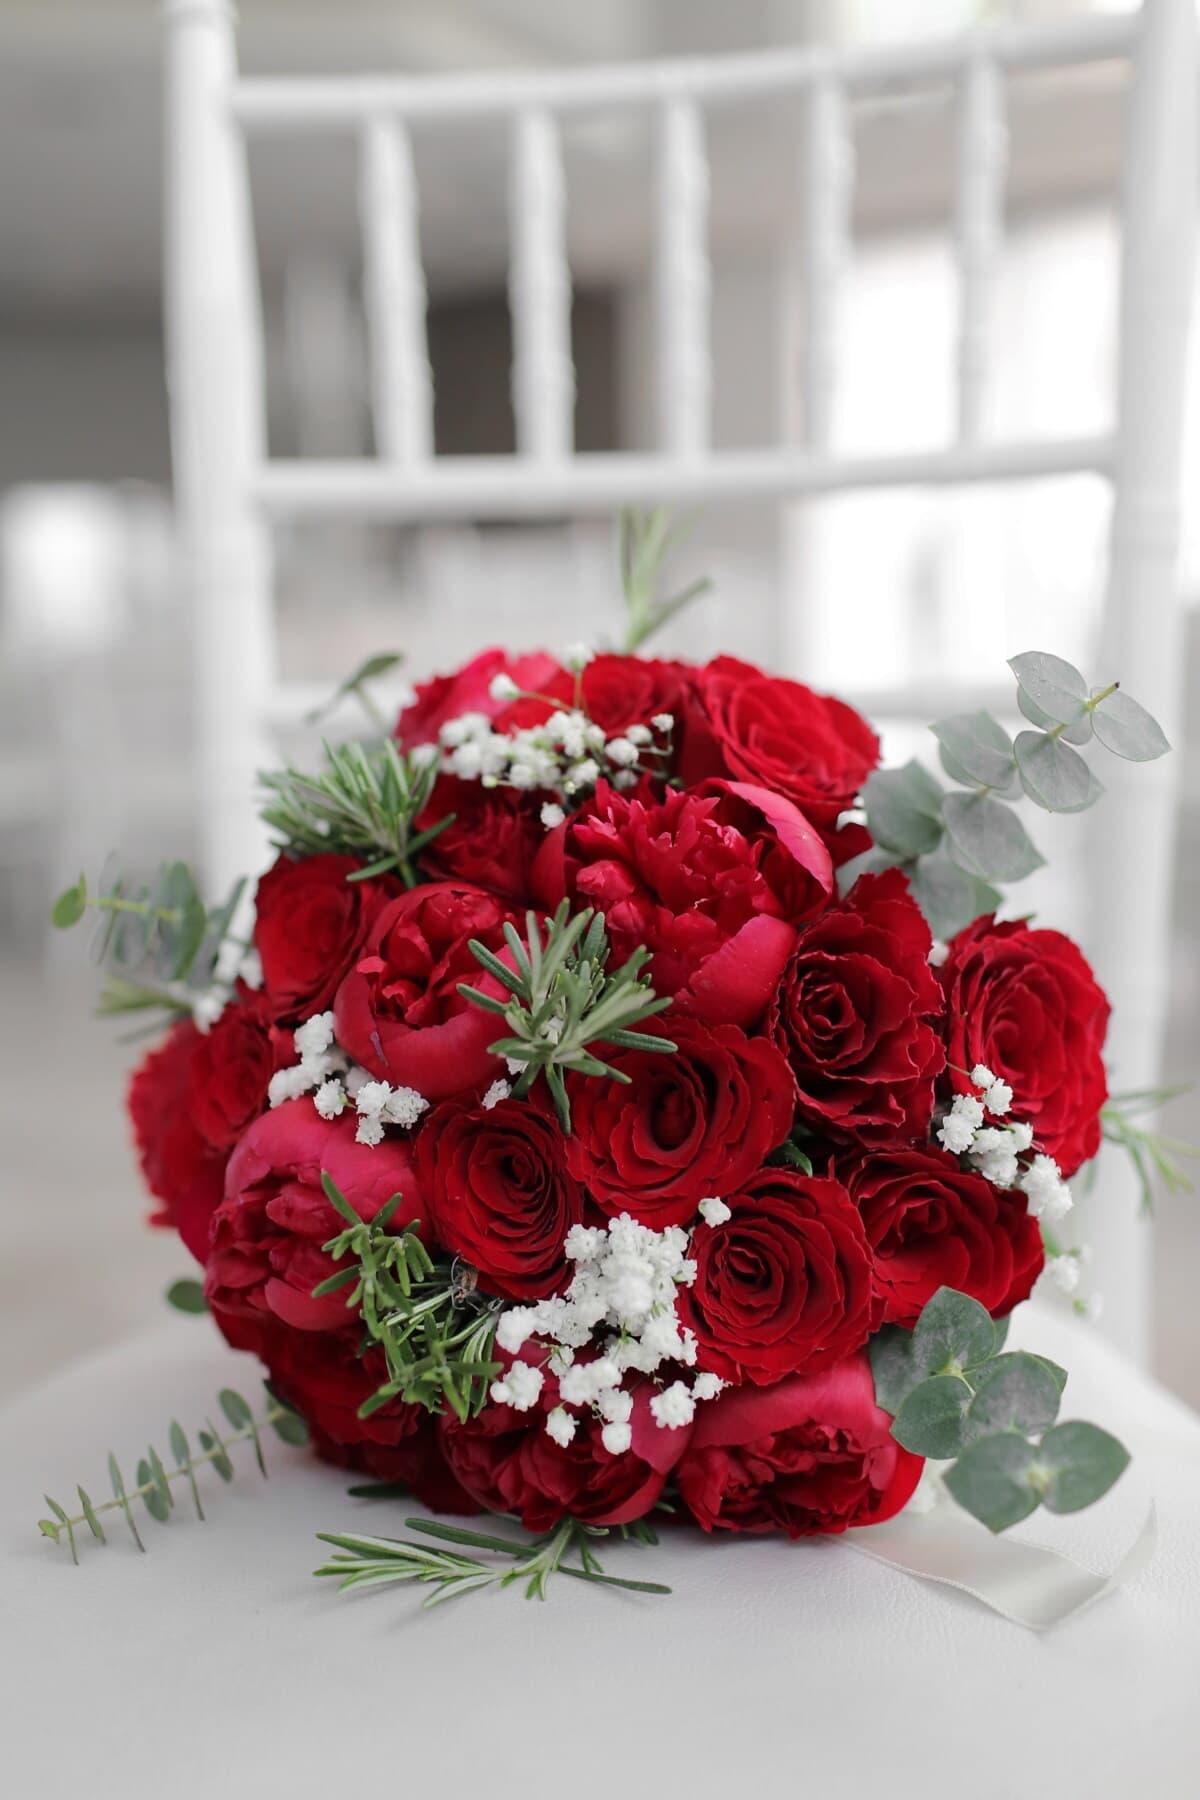 bouquet, elegant, red, rose, white, chair, roses, decoration, arrangement, flower